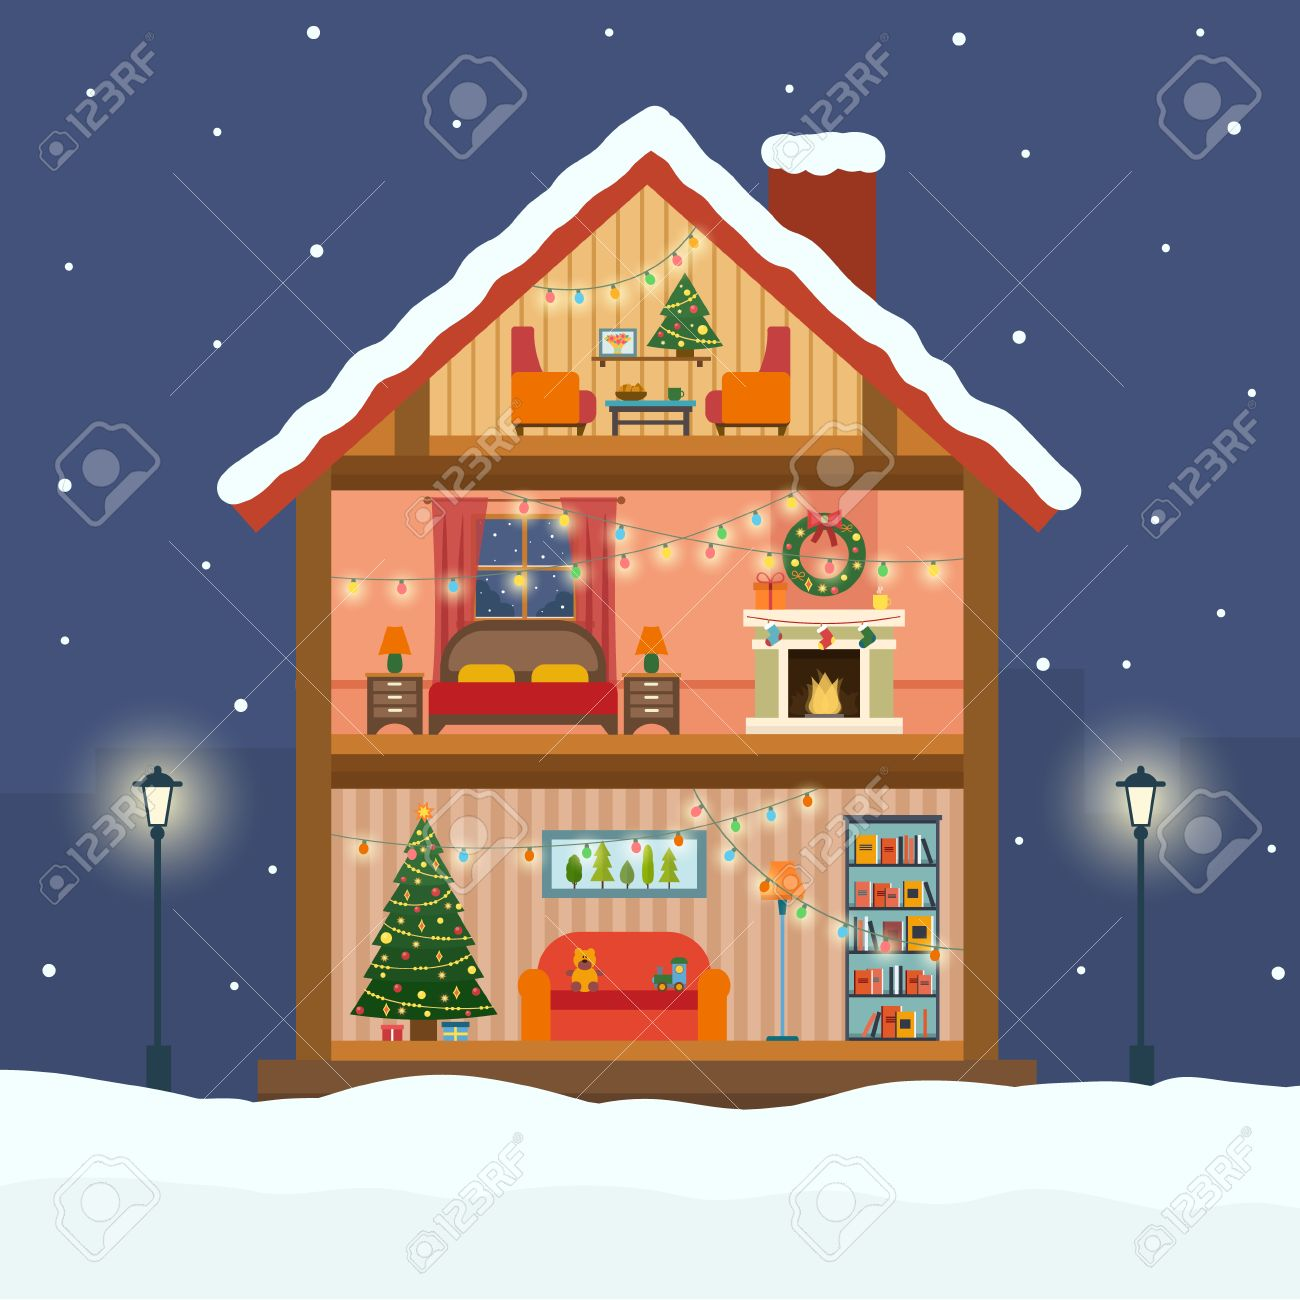 Snow house christmas tree decorations